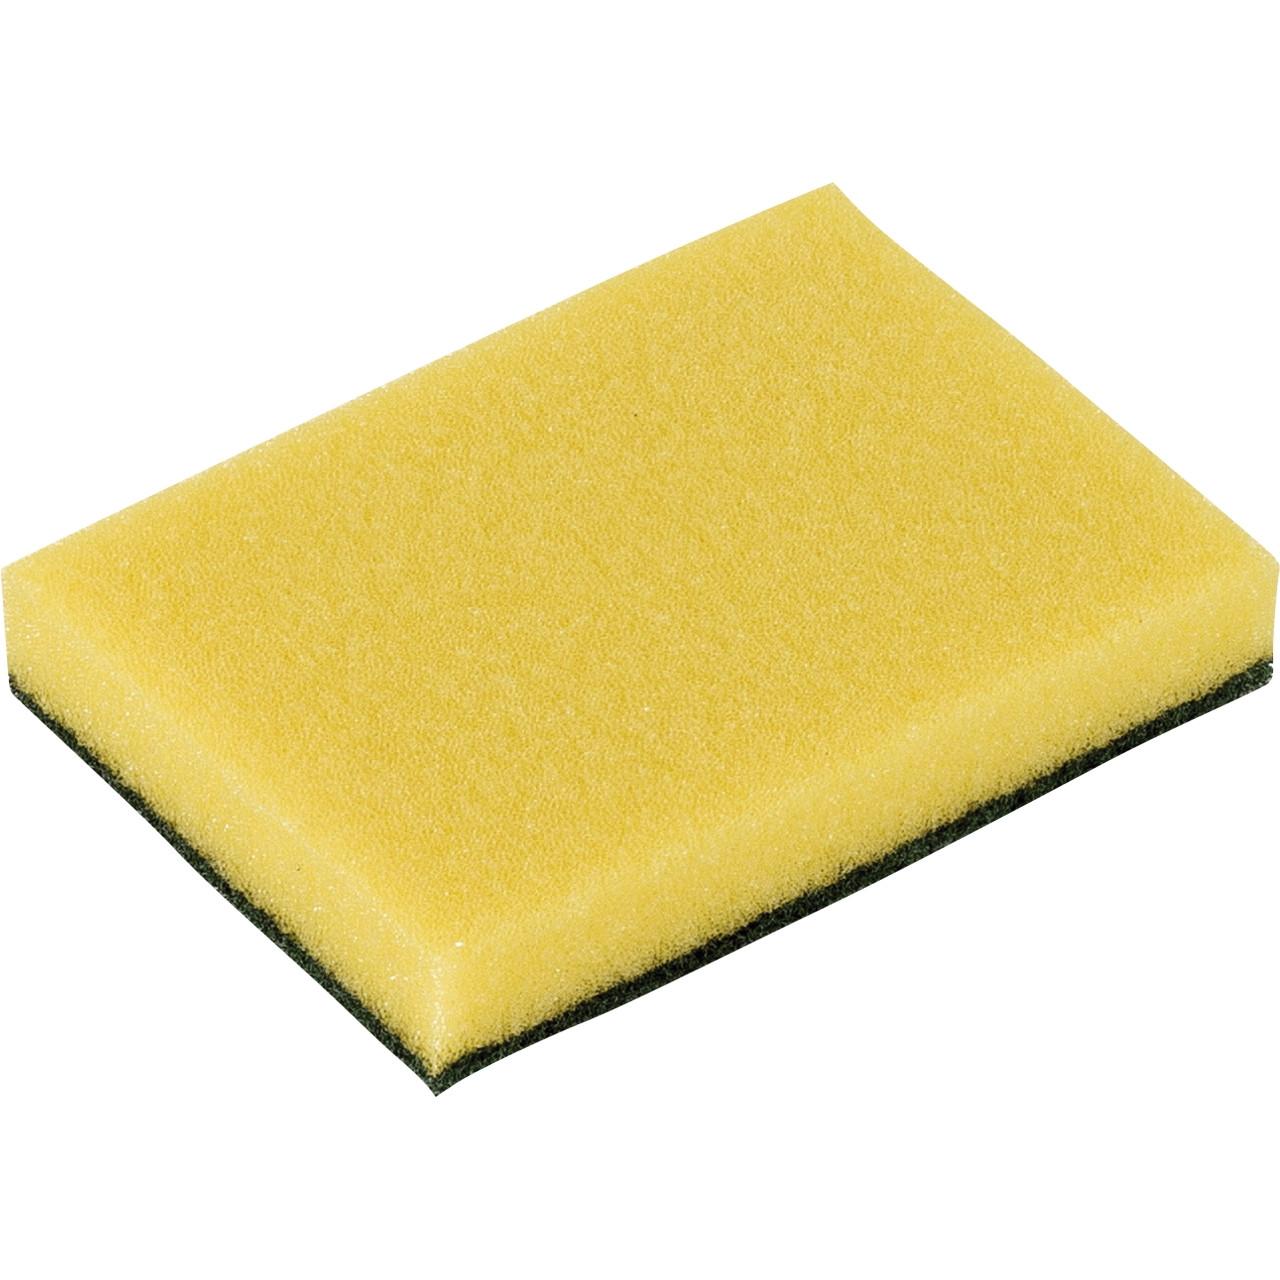 Fregall verd+esponja Pla